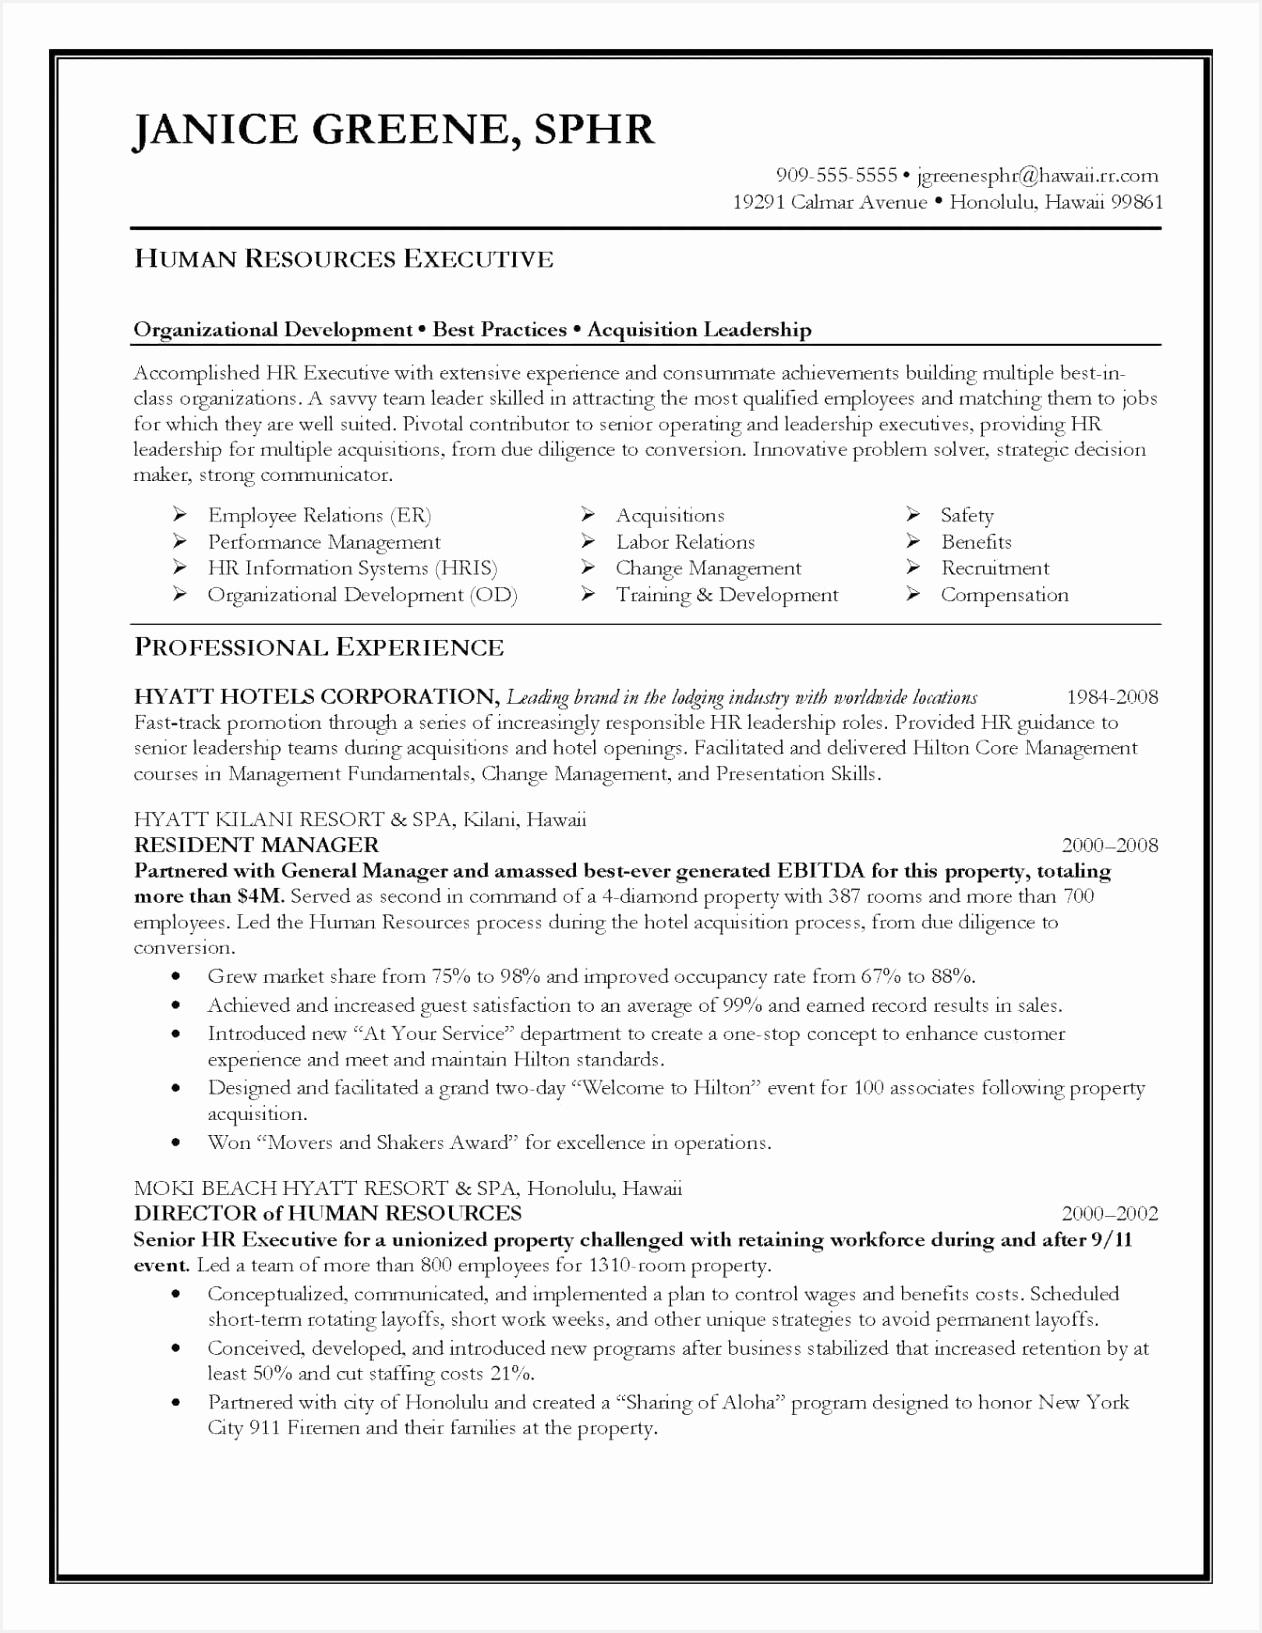 Example Profile Resume Best Resume Professional Profile Lovely Summary A Resume Lovely Best 16331262tsrz